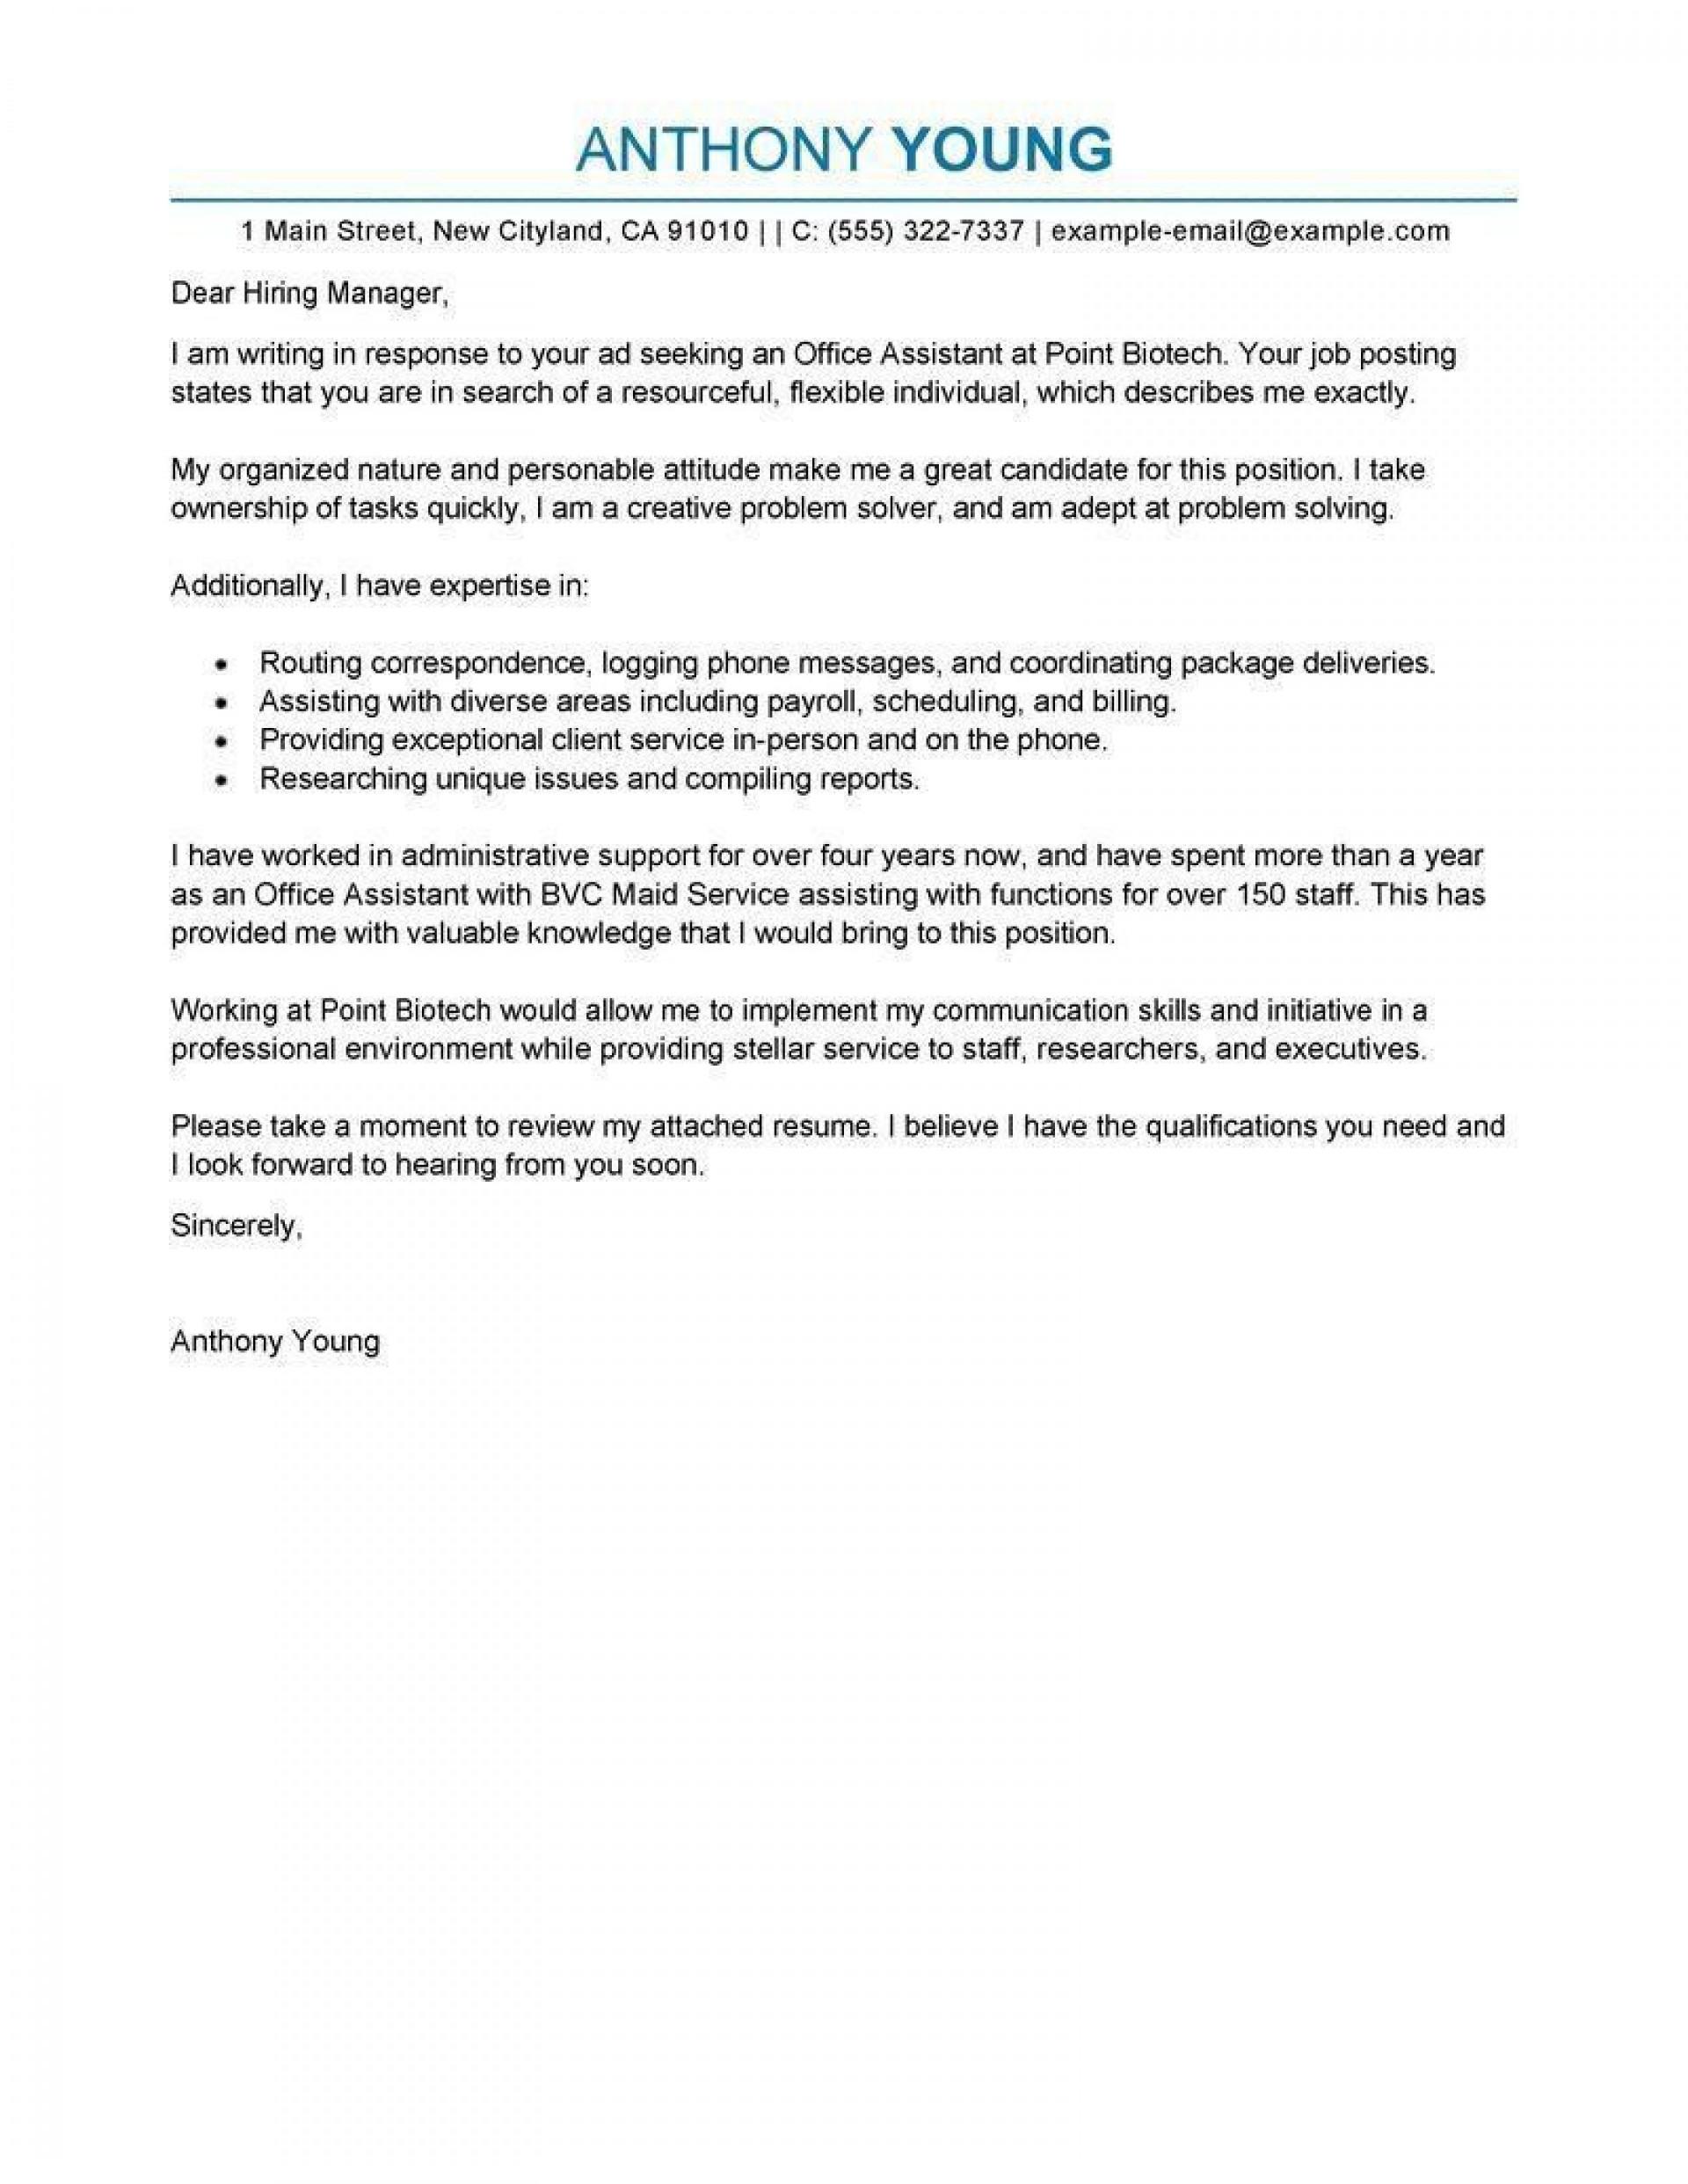 008 Singular Email Cover Letter Sample High Def  Samples Resume Example Of For Job Internship1920